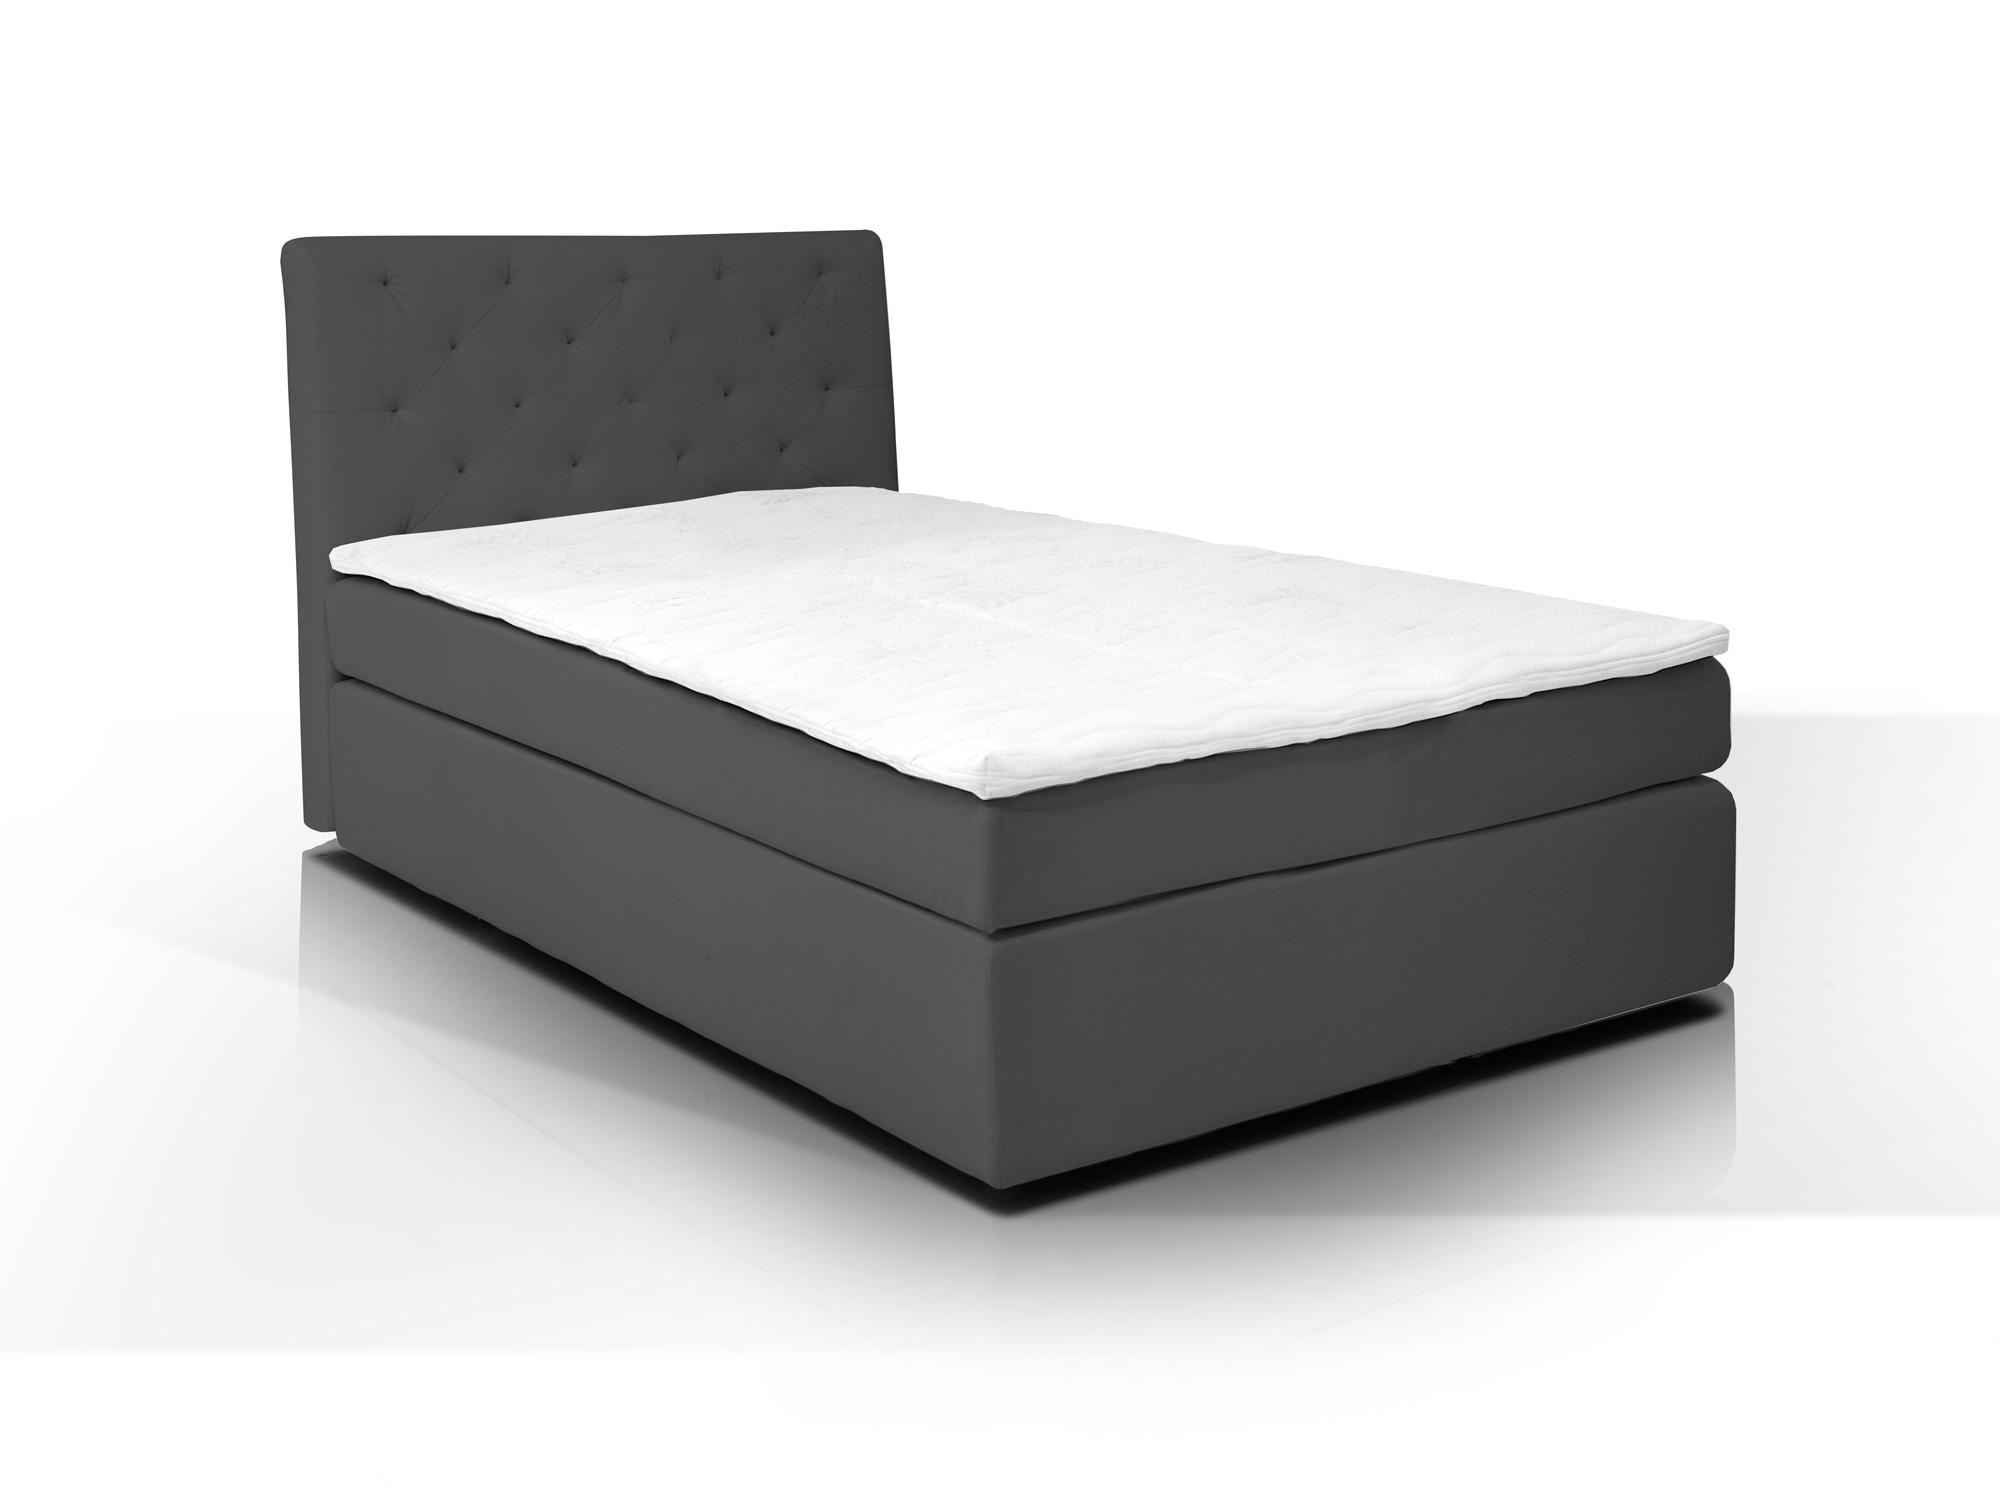 hotel boxspringbett webstoffbezug 80 x 200 cm anthrazit h rtegrad 2. Black Bedroom Furniture Sets. Home Design Ideas